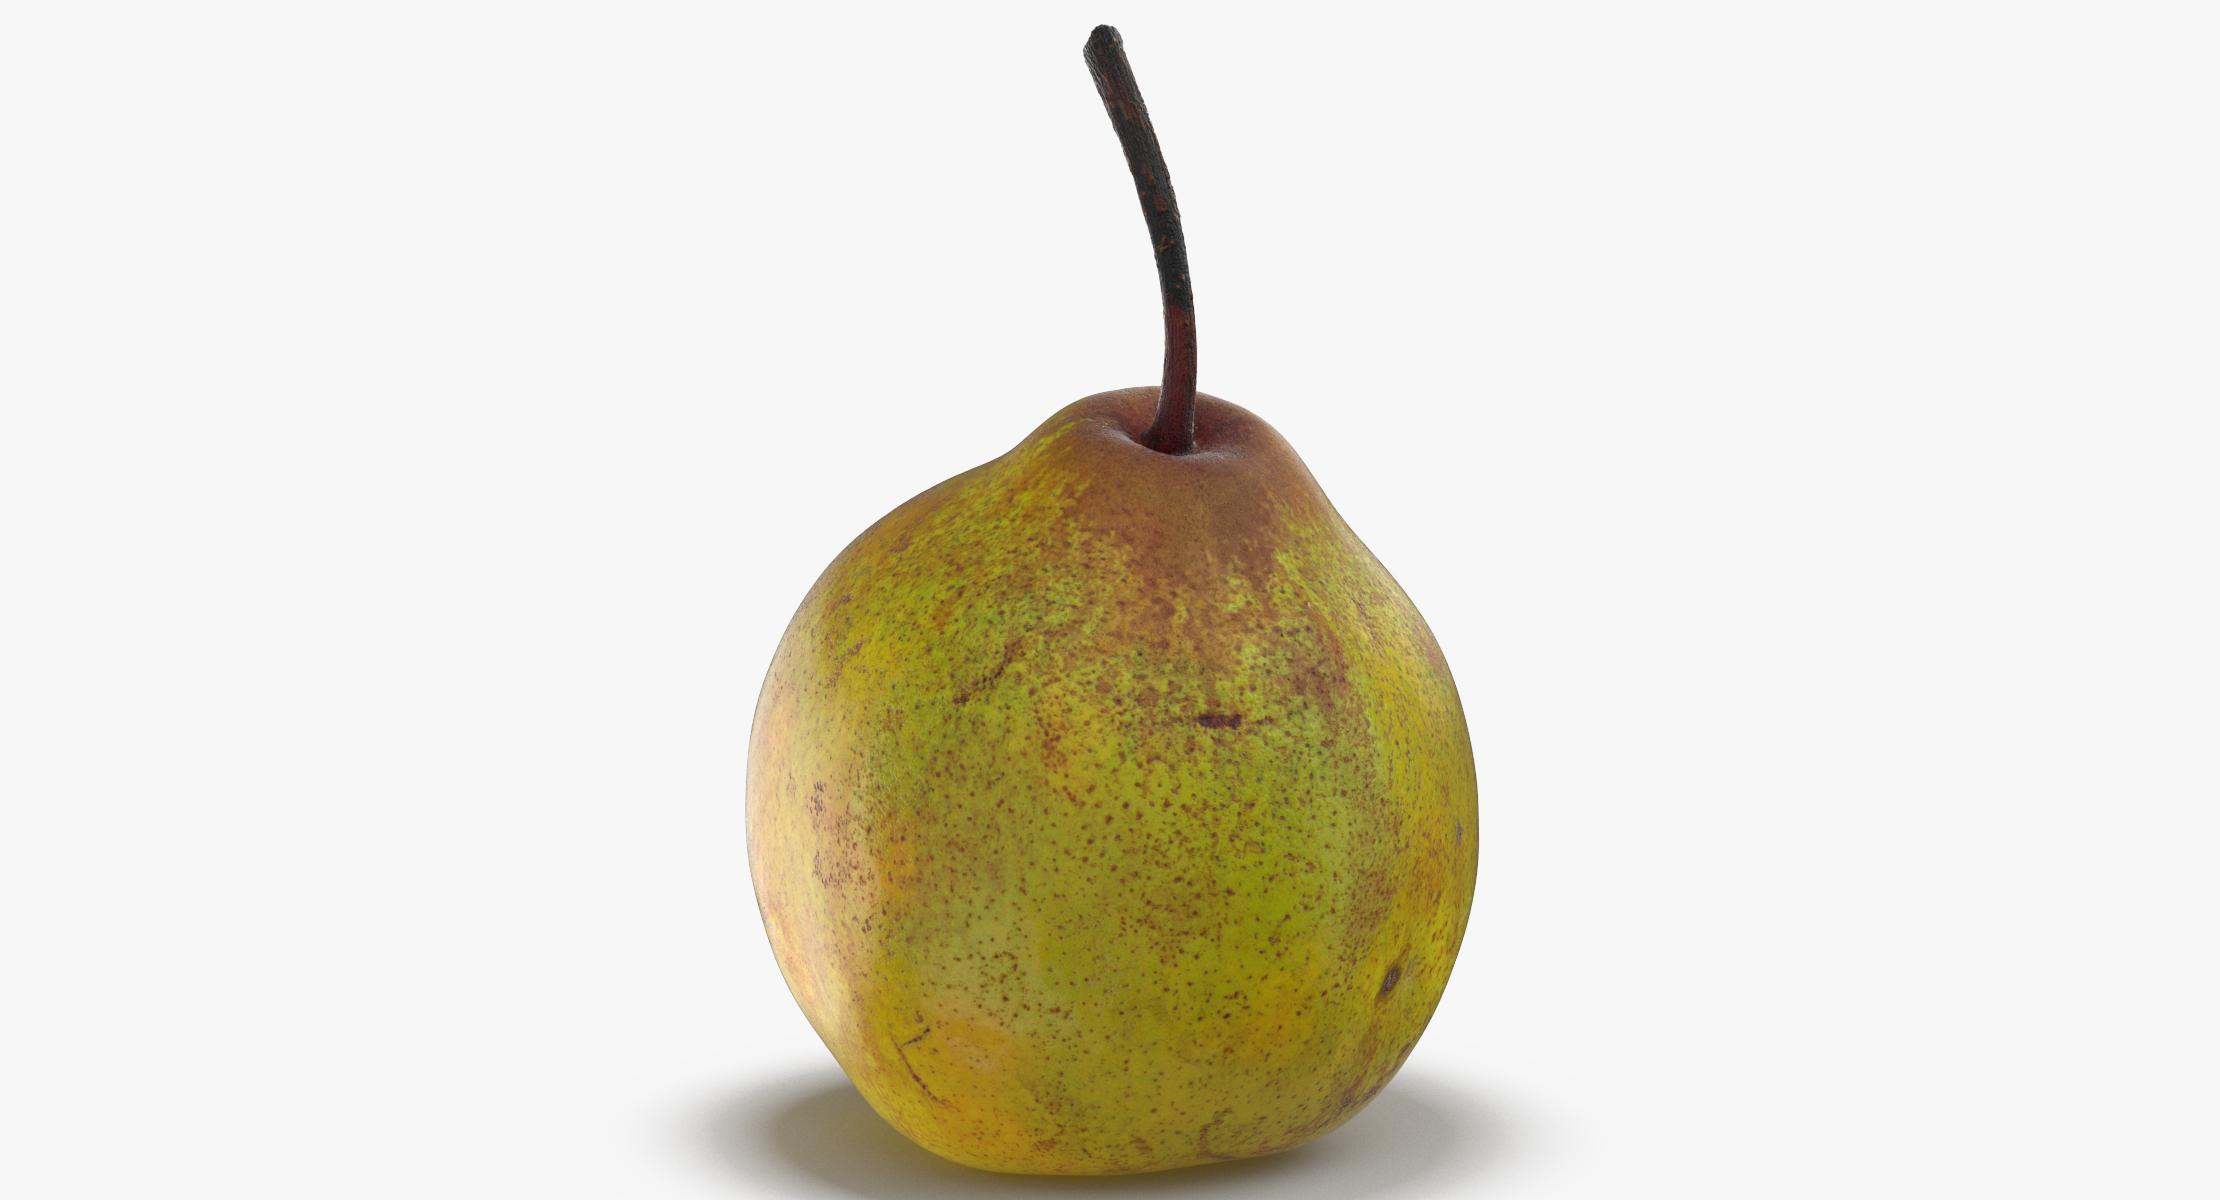 Pear 03 - reel 1